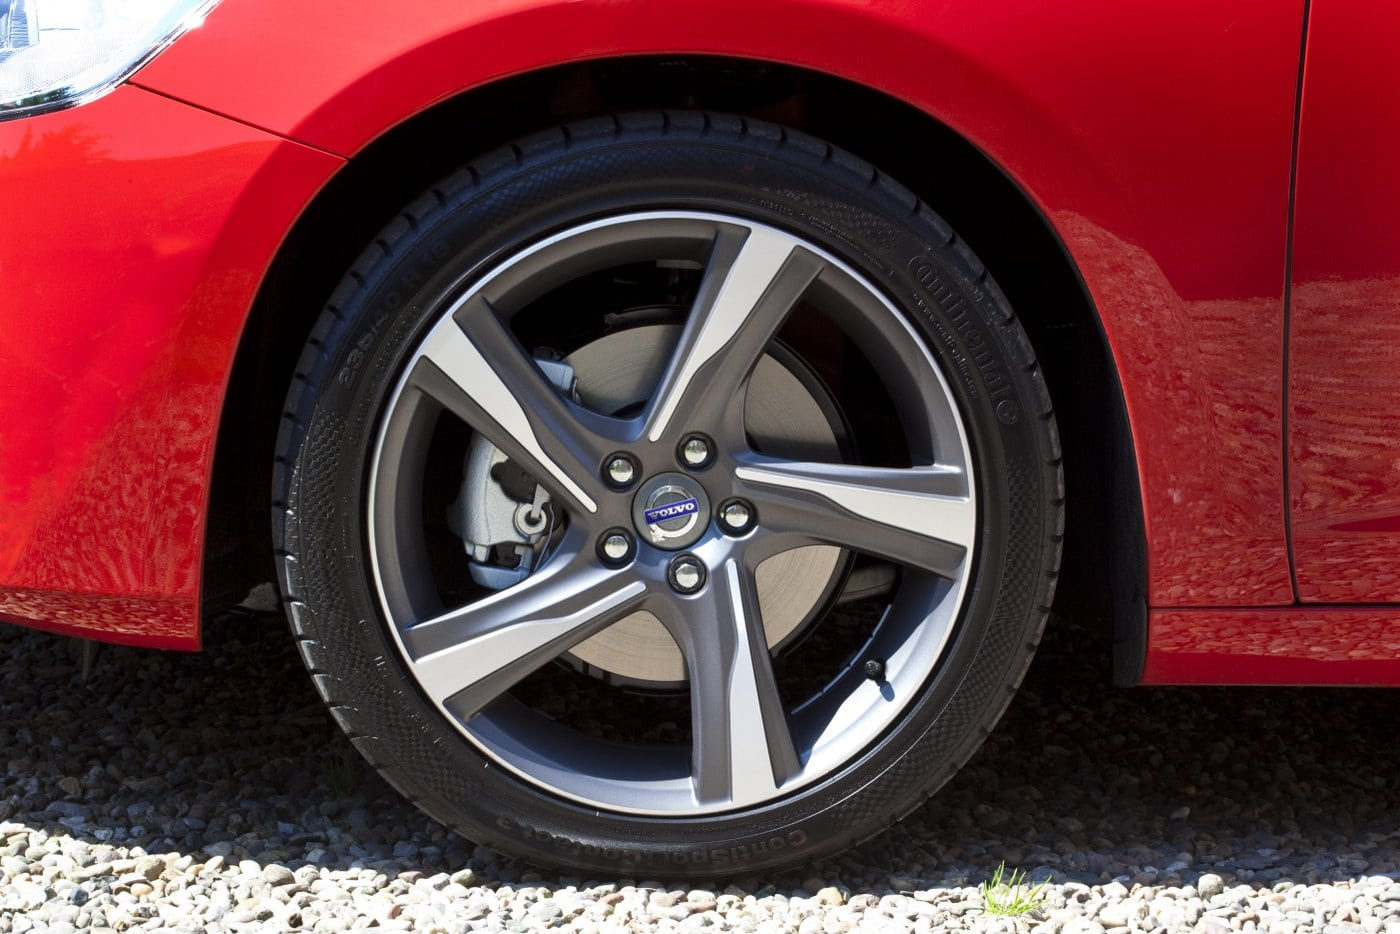 Brake seen inside a car wheel